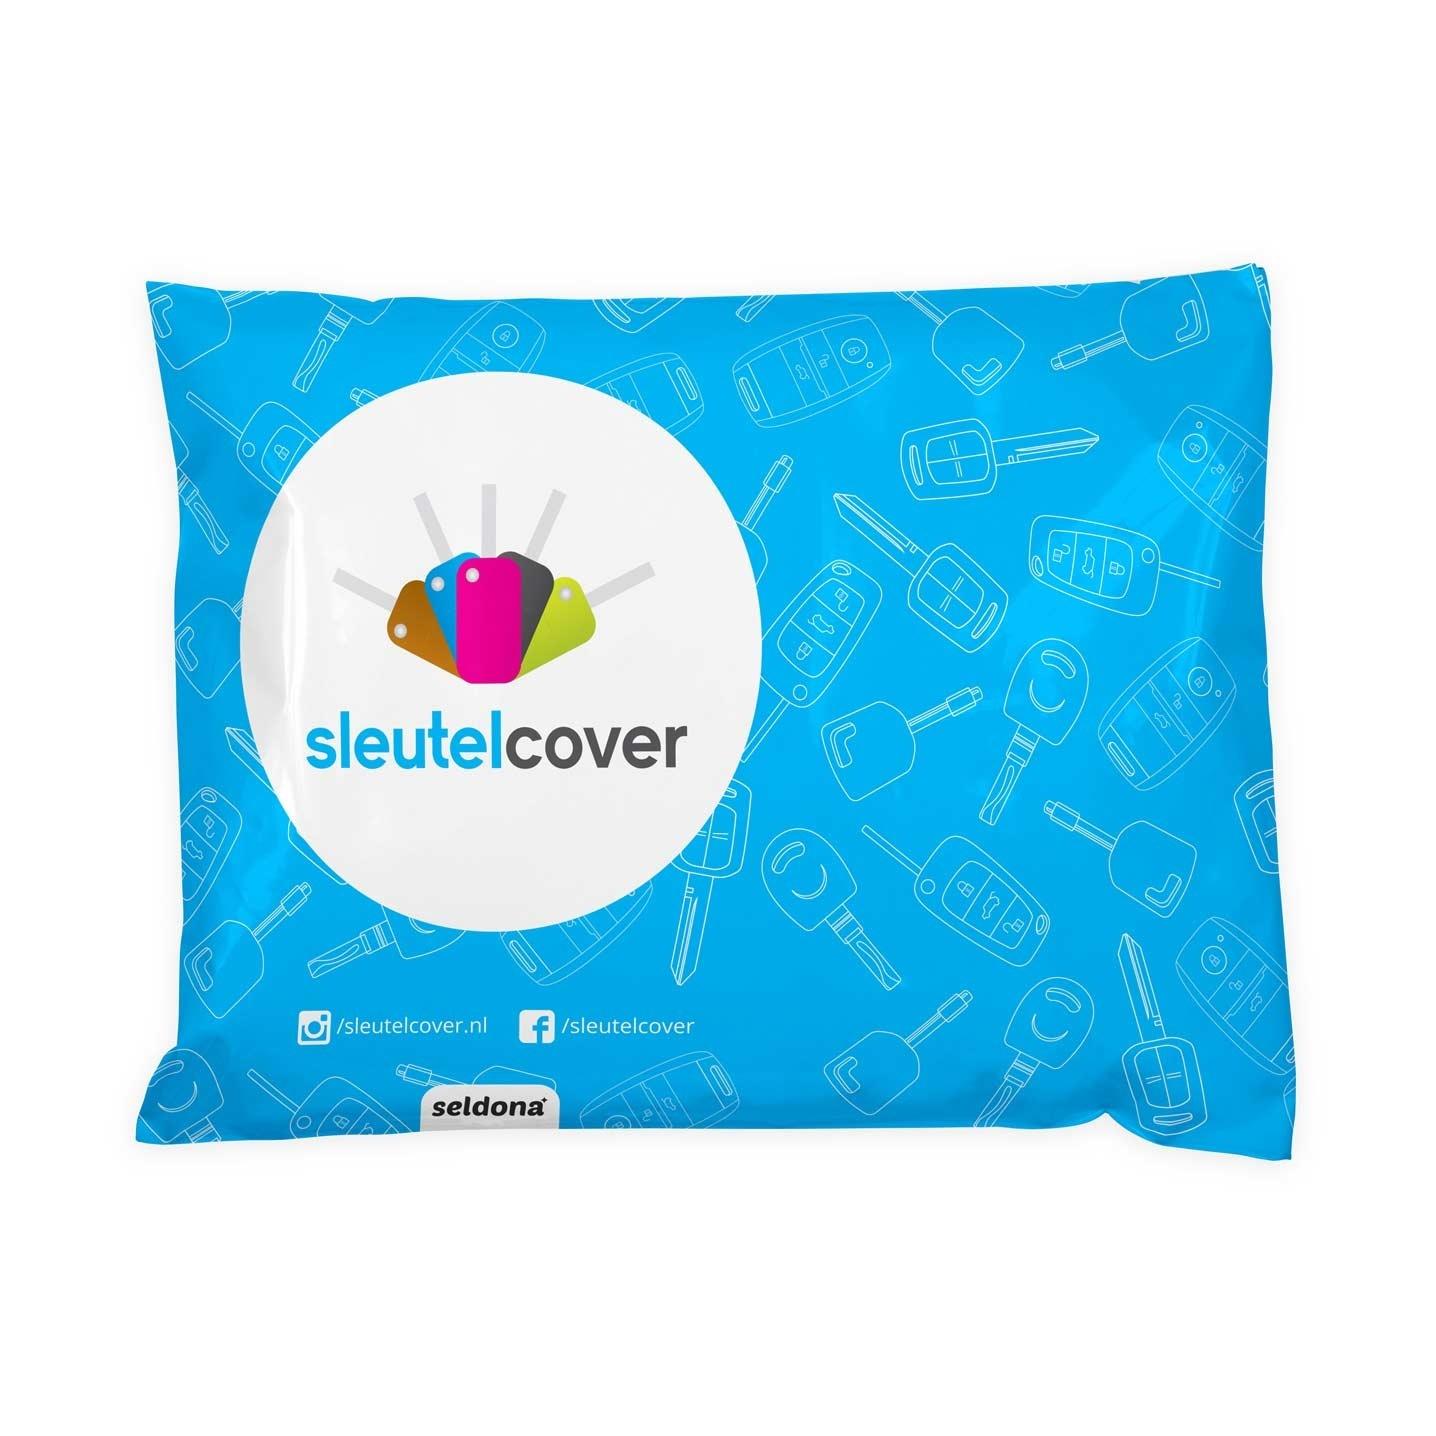 Land Rover SleutelCover - Wit / Silicone sleutelhoesje / beschermhoesje autosleutel